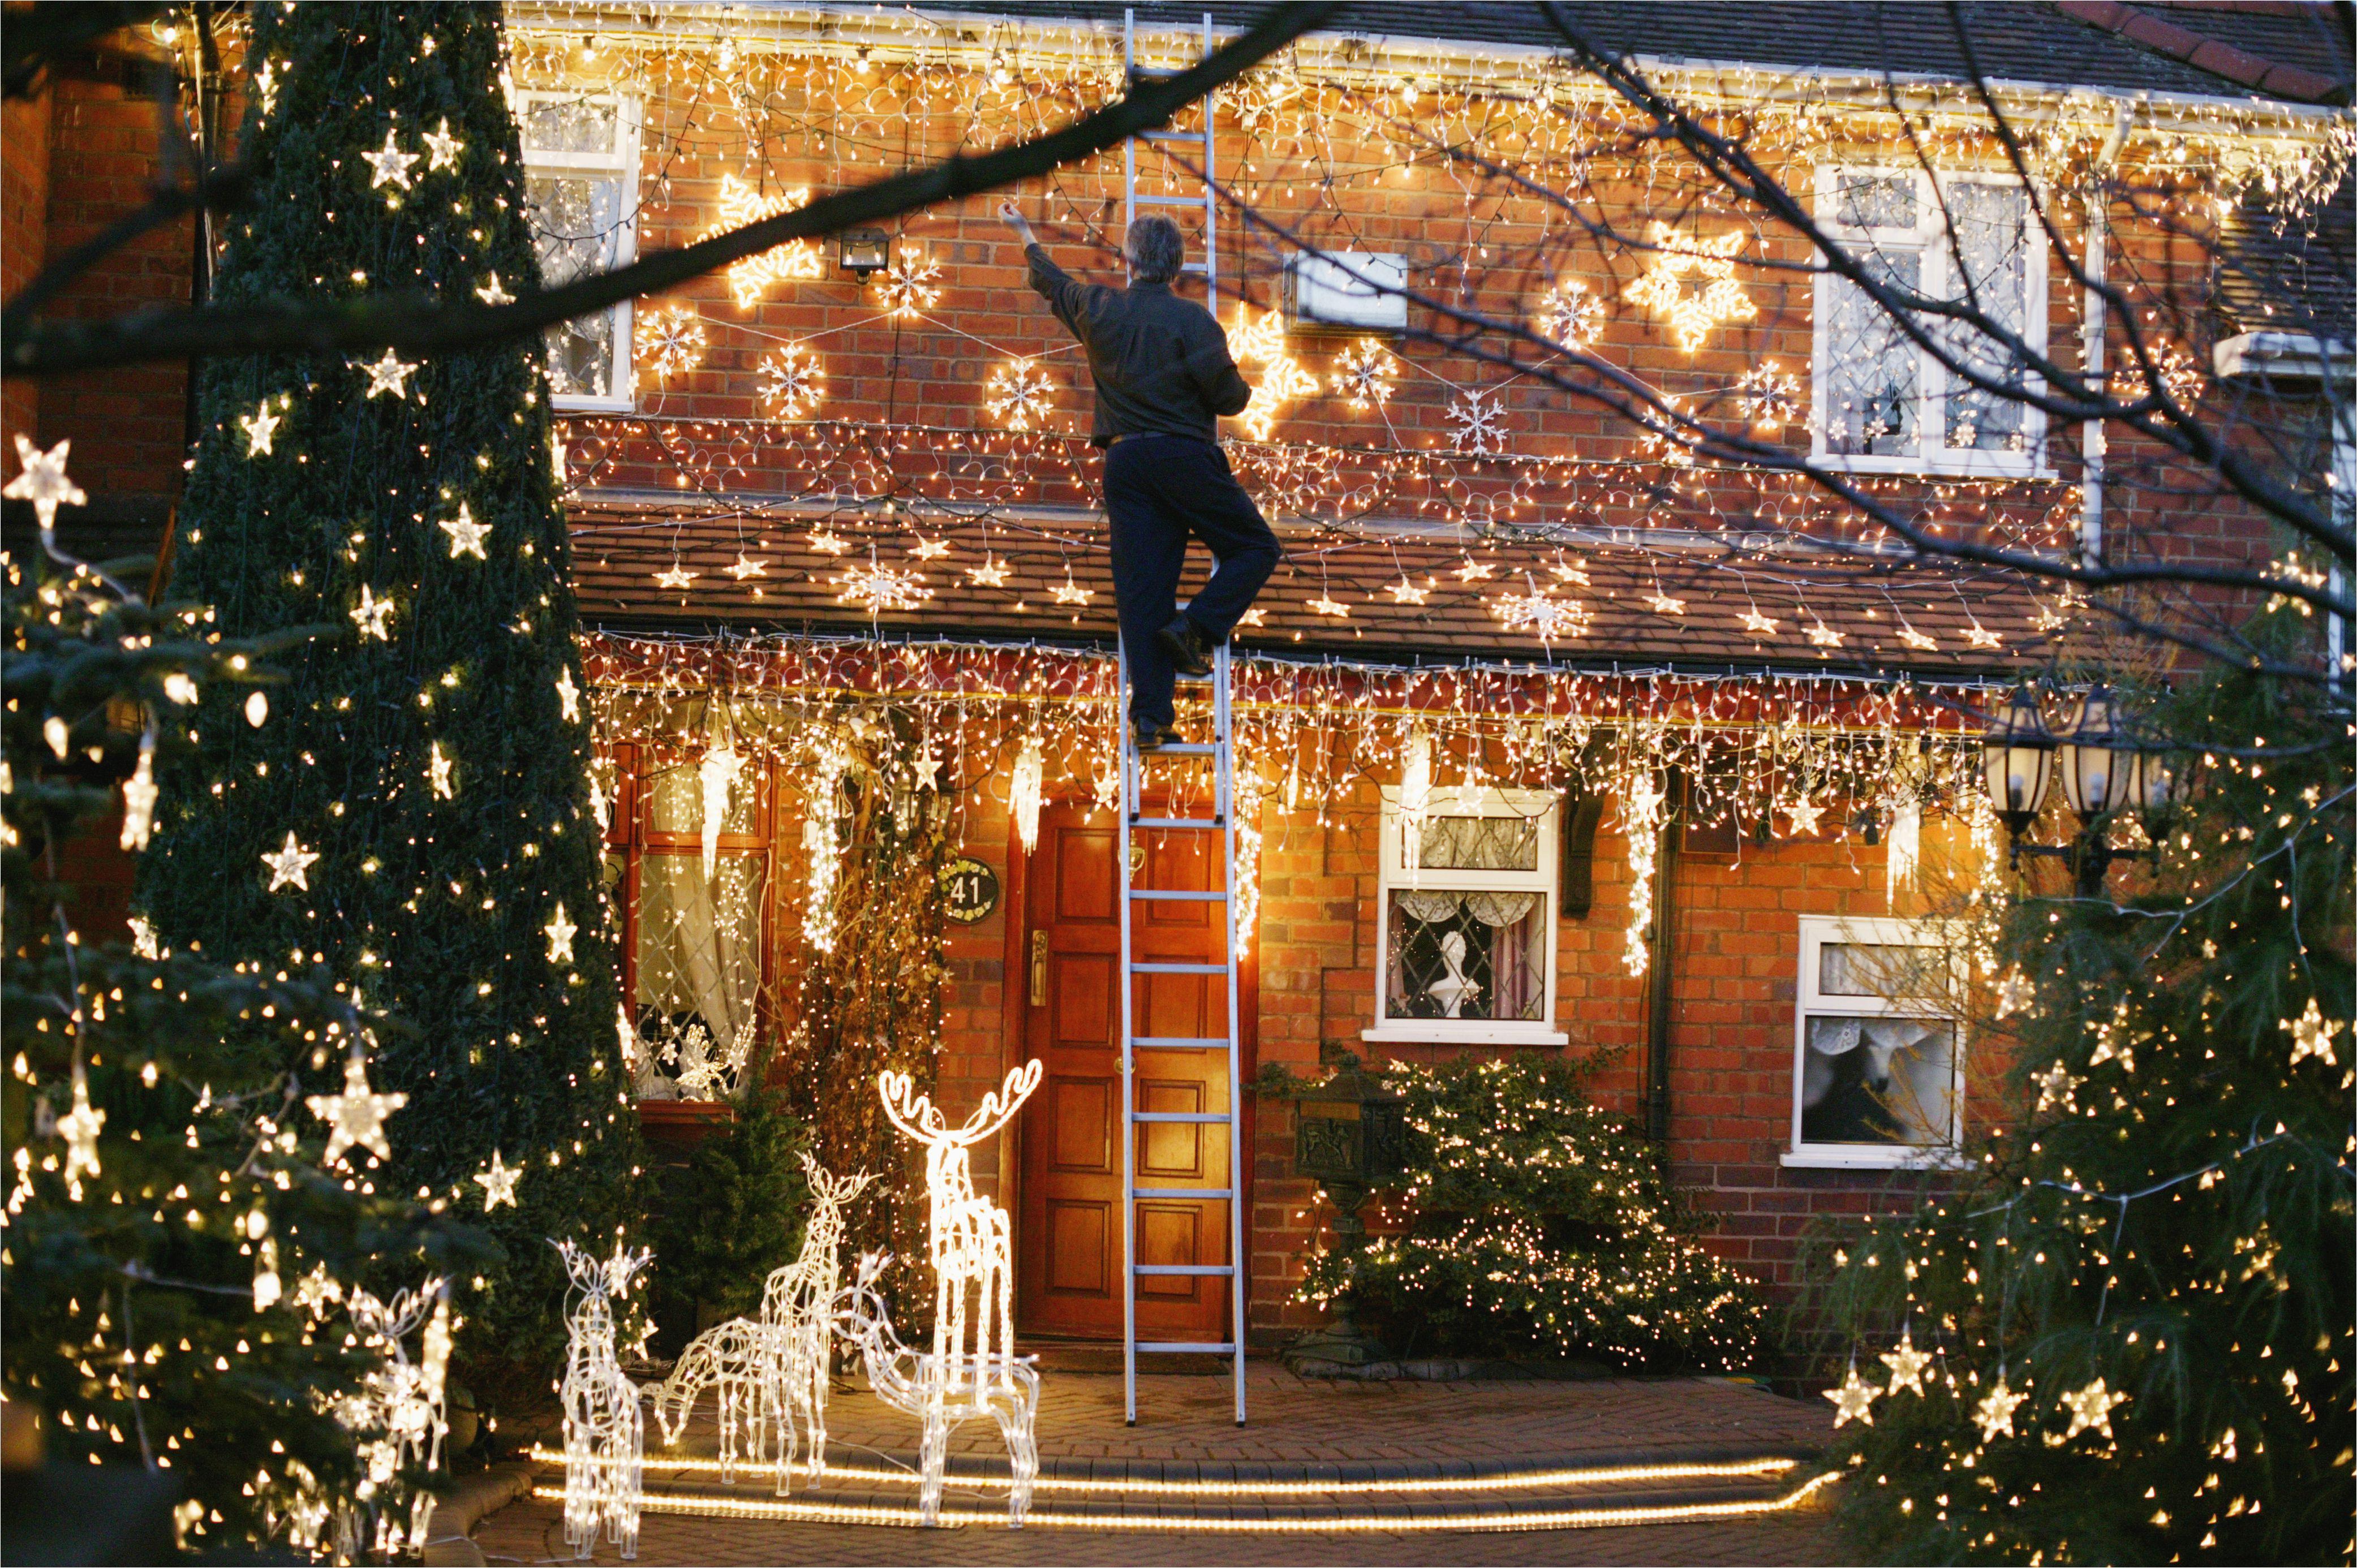 christmas lights in the front garden of a house 522104326 5a1ef4ff4e46ba001a9ac0bf jpg